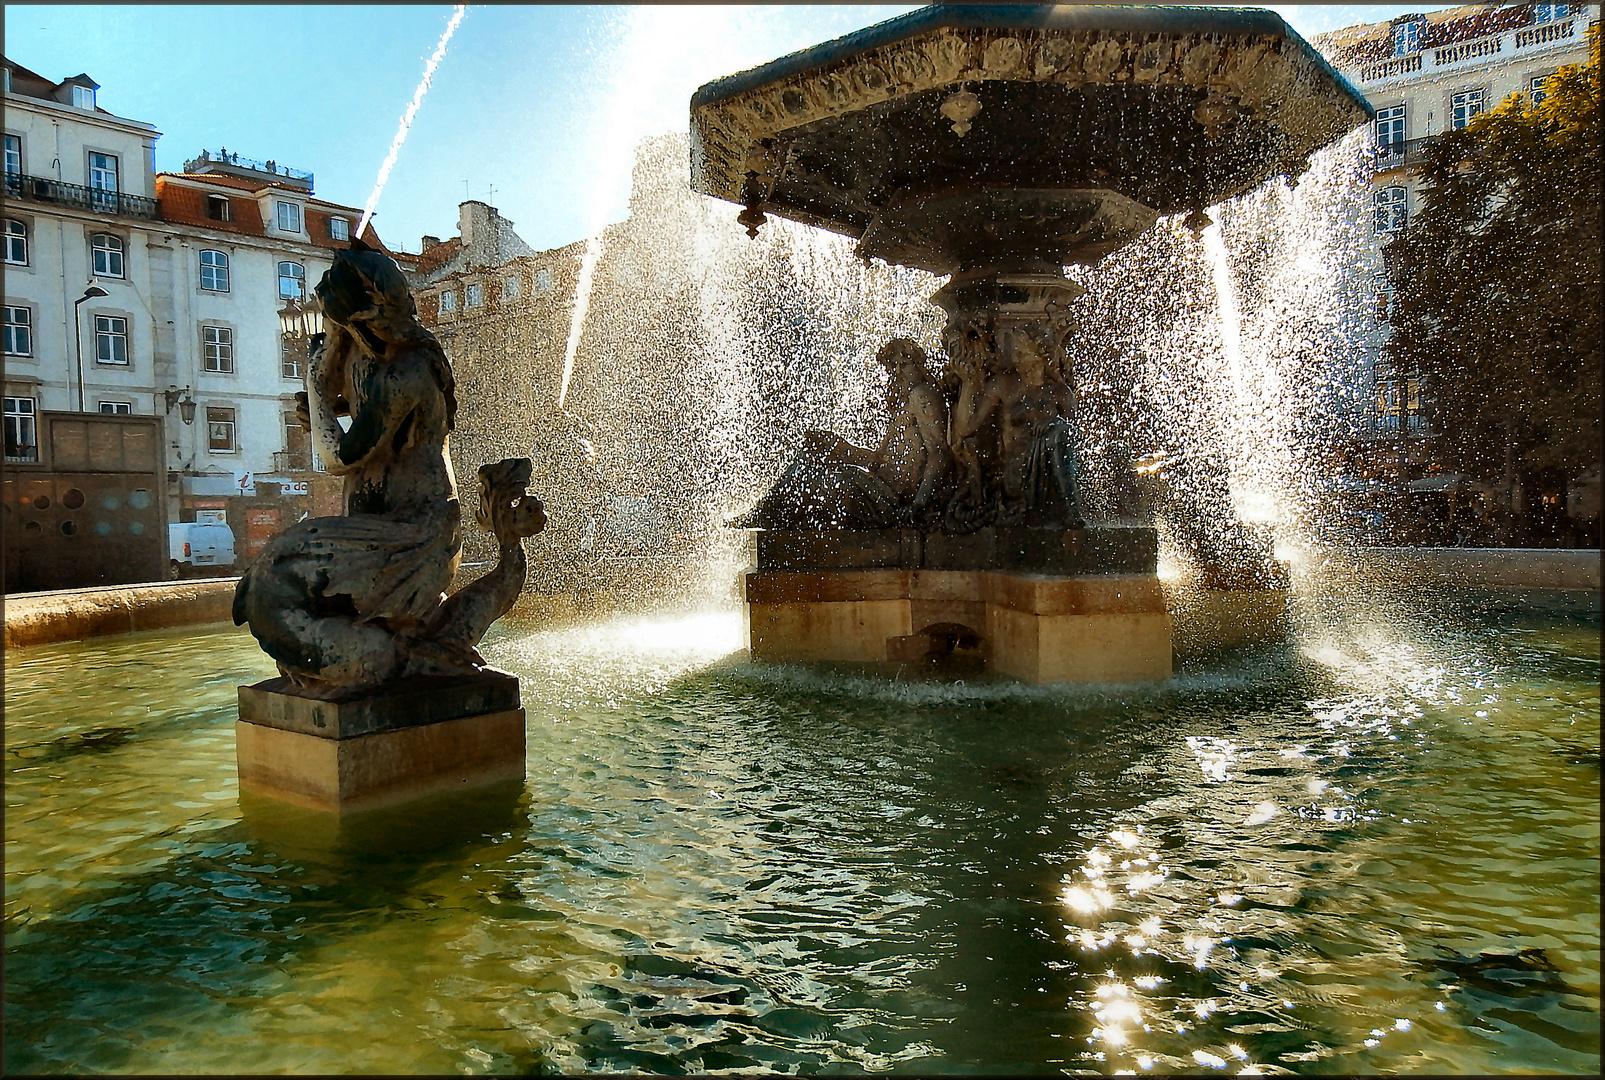 Fountain at Lisboa